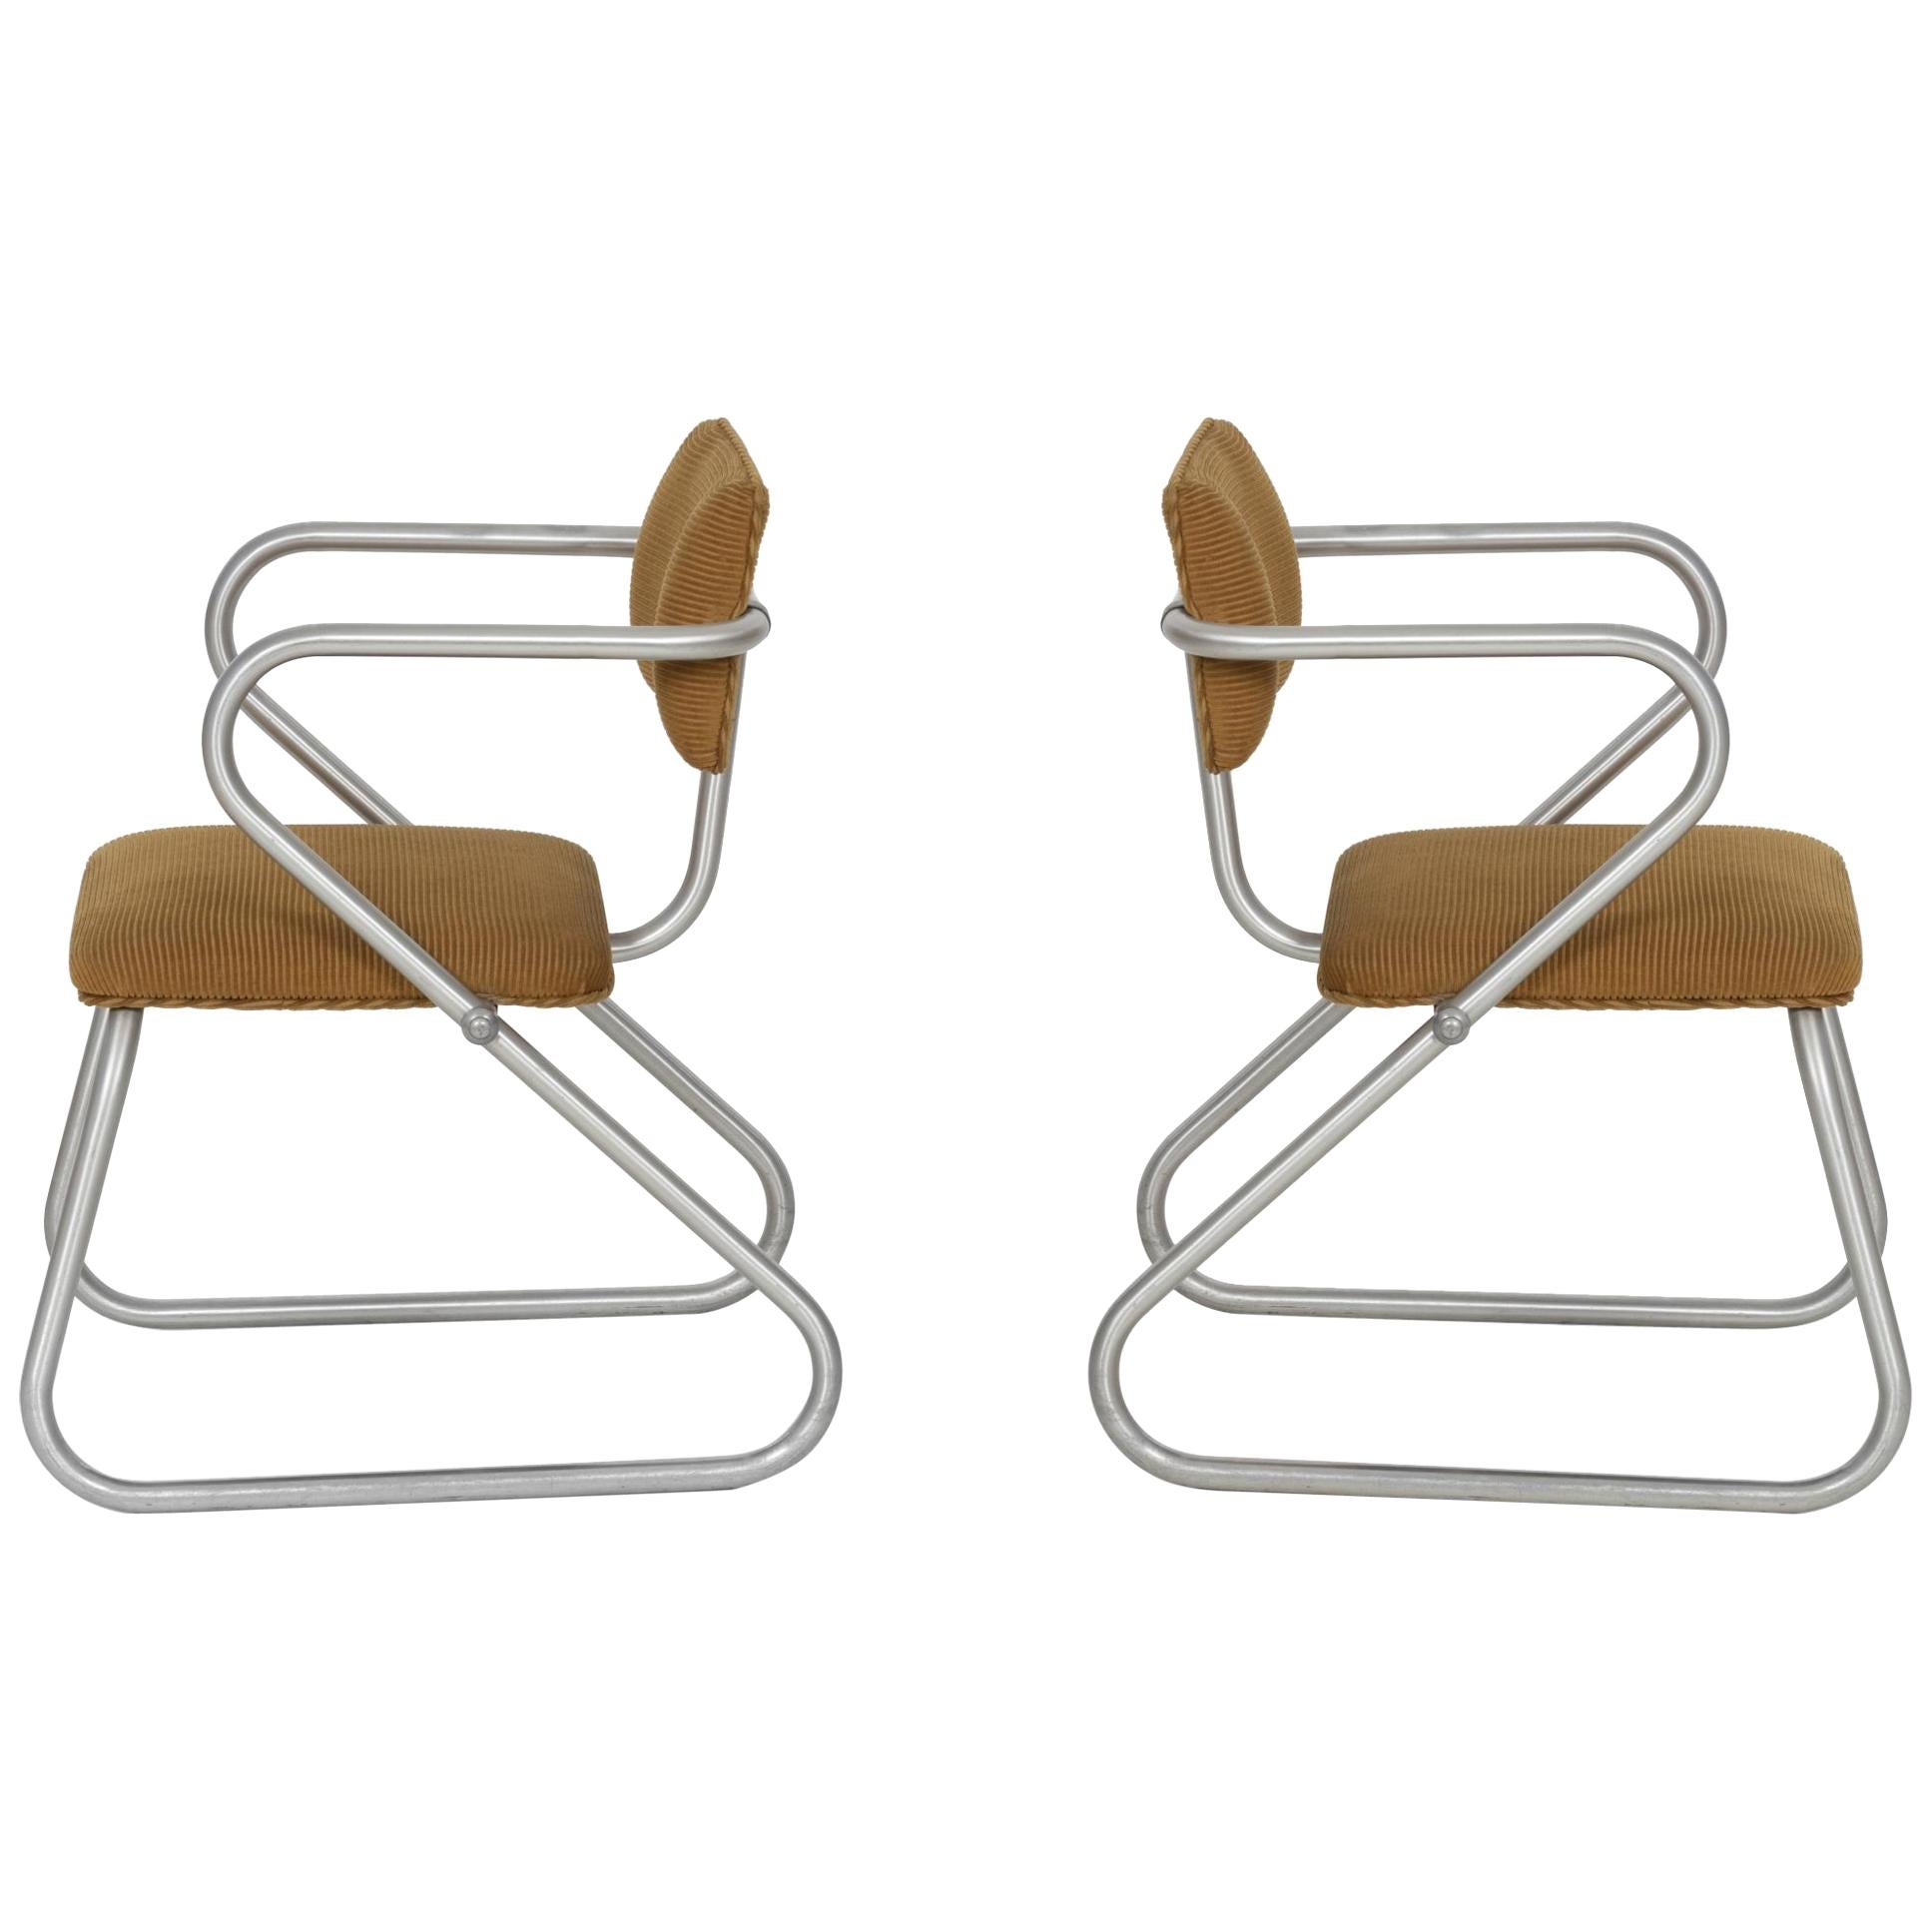 Warren McCarthur Occasional Chairs